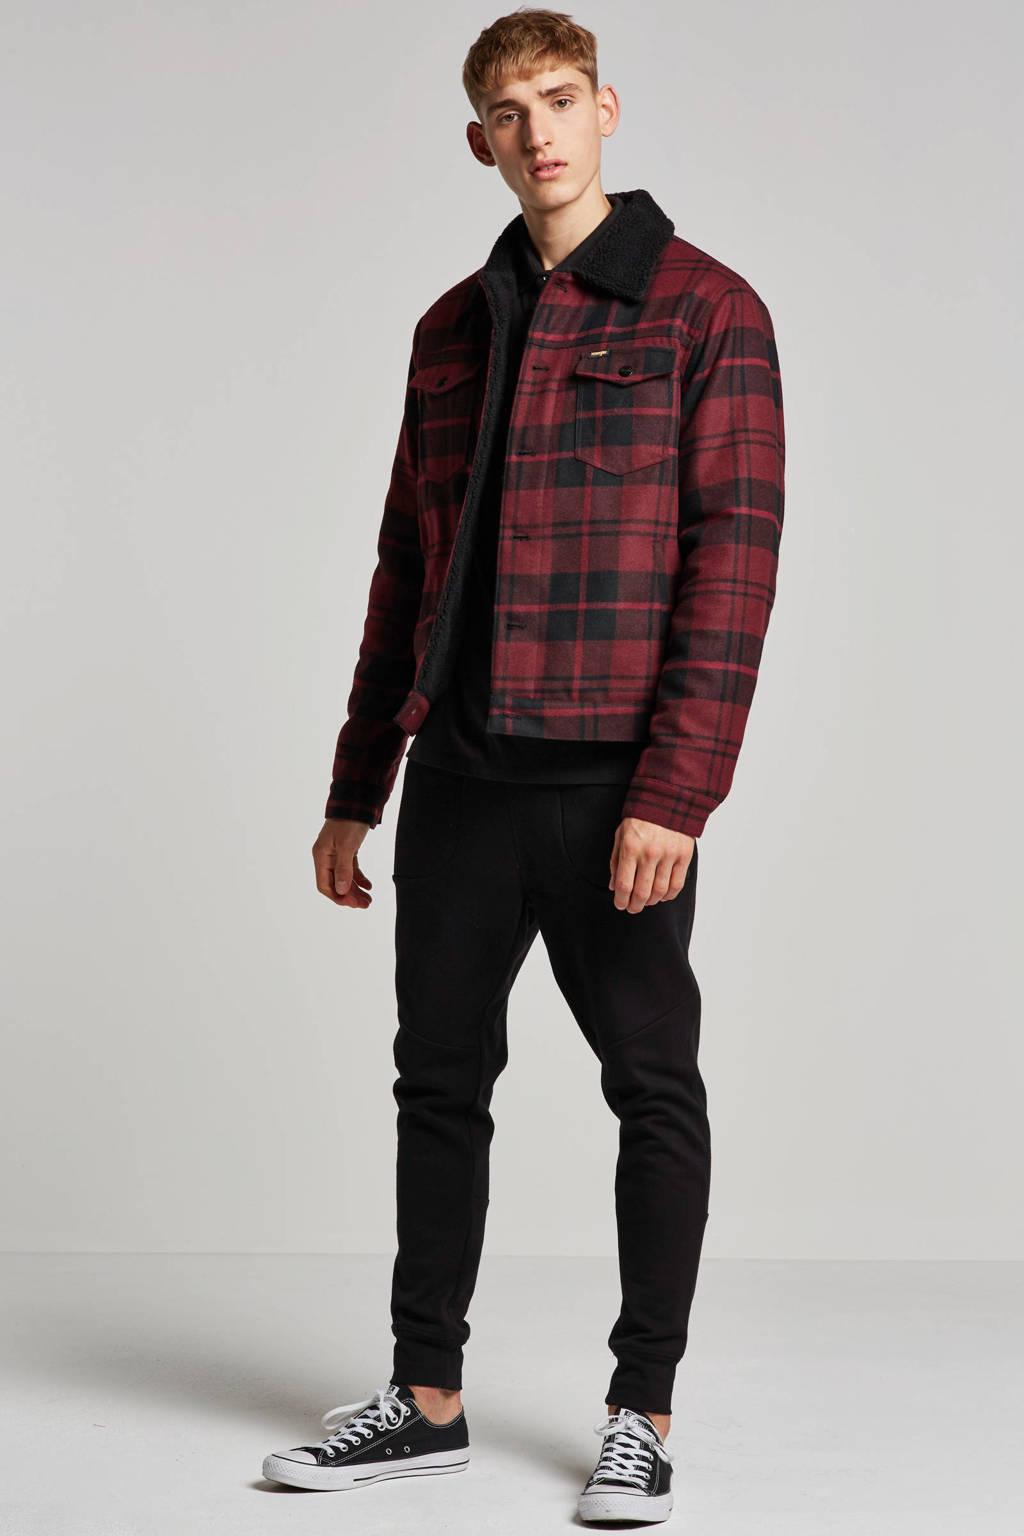 Wrangler jas met wol, Rood/zwart